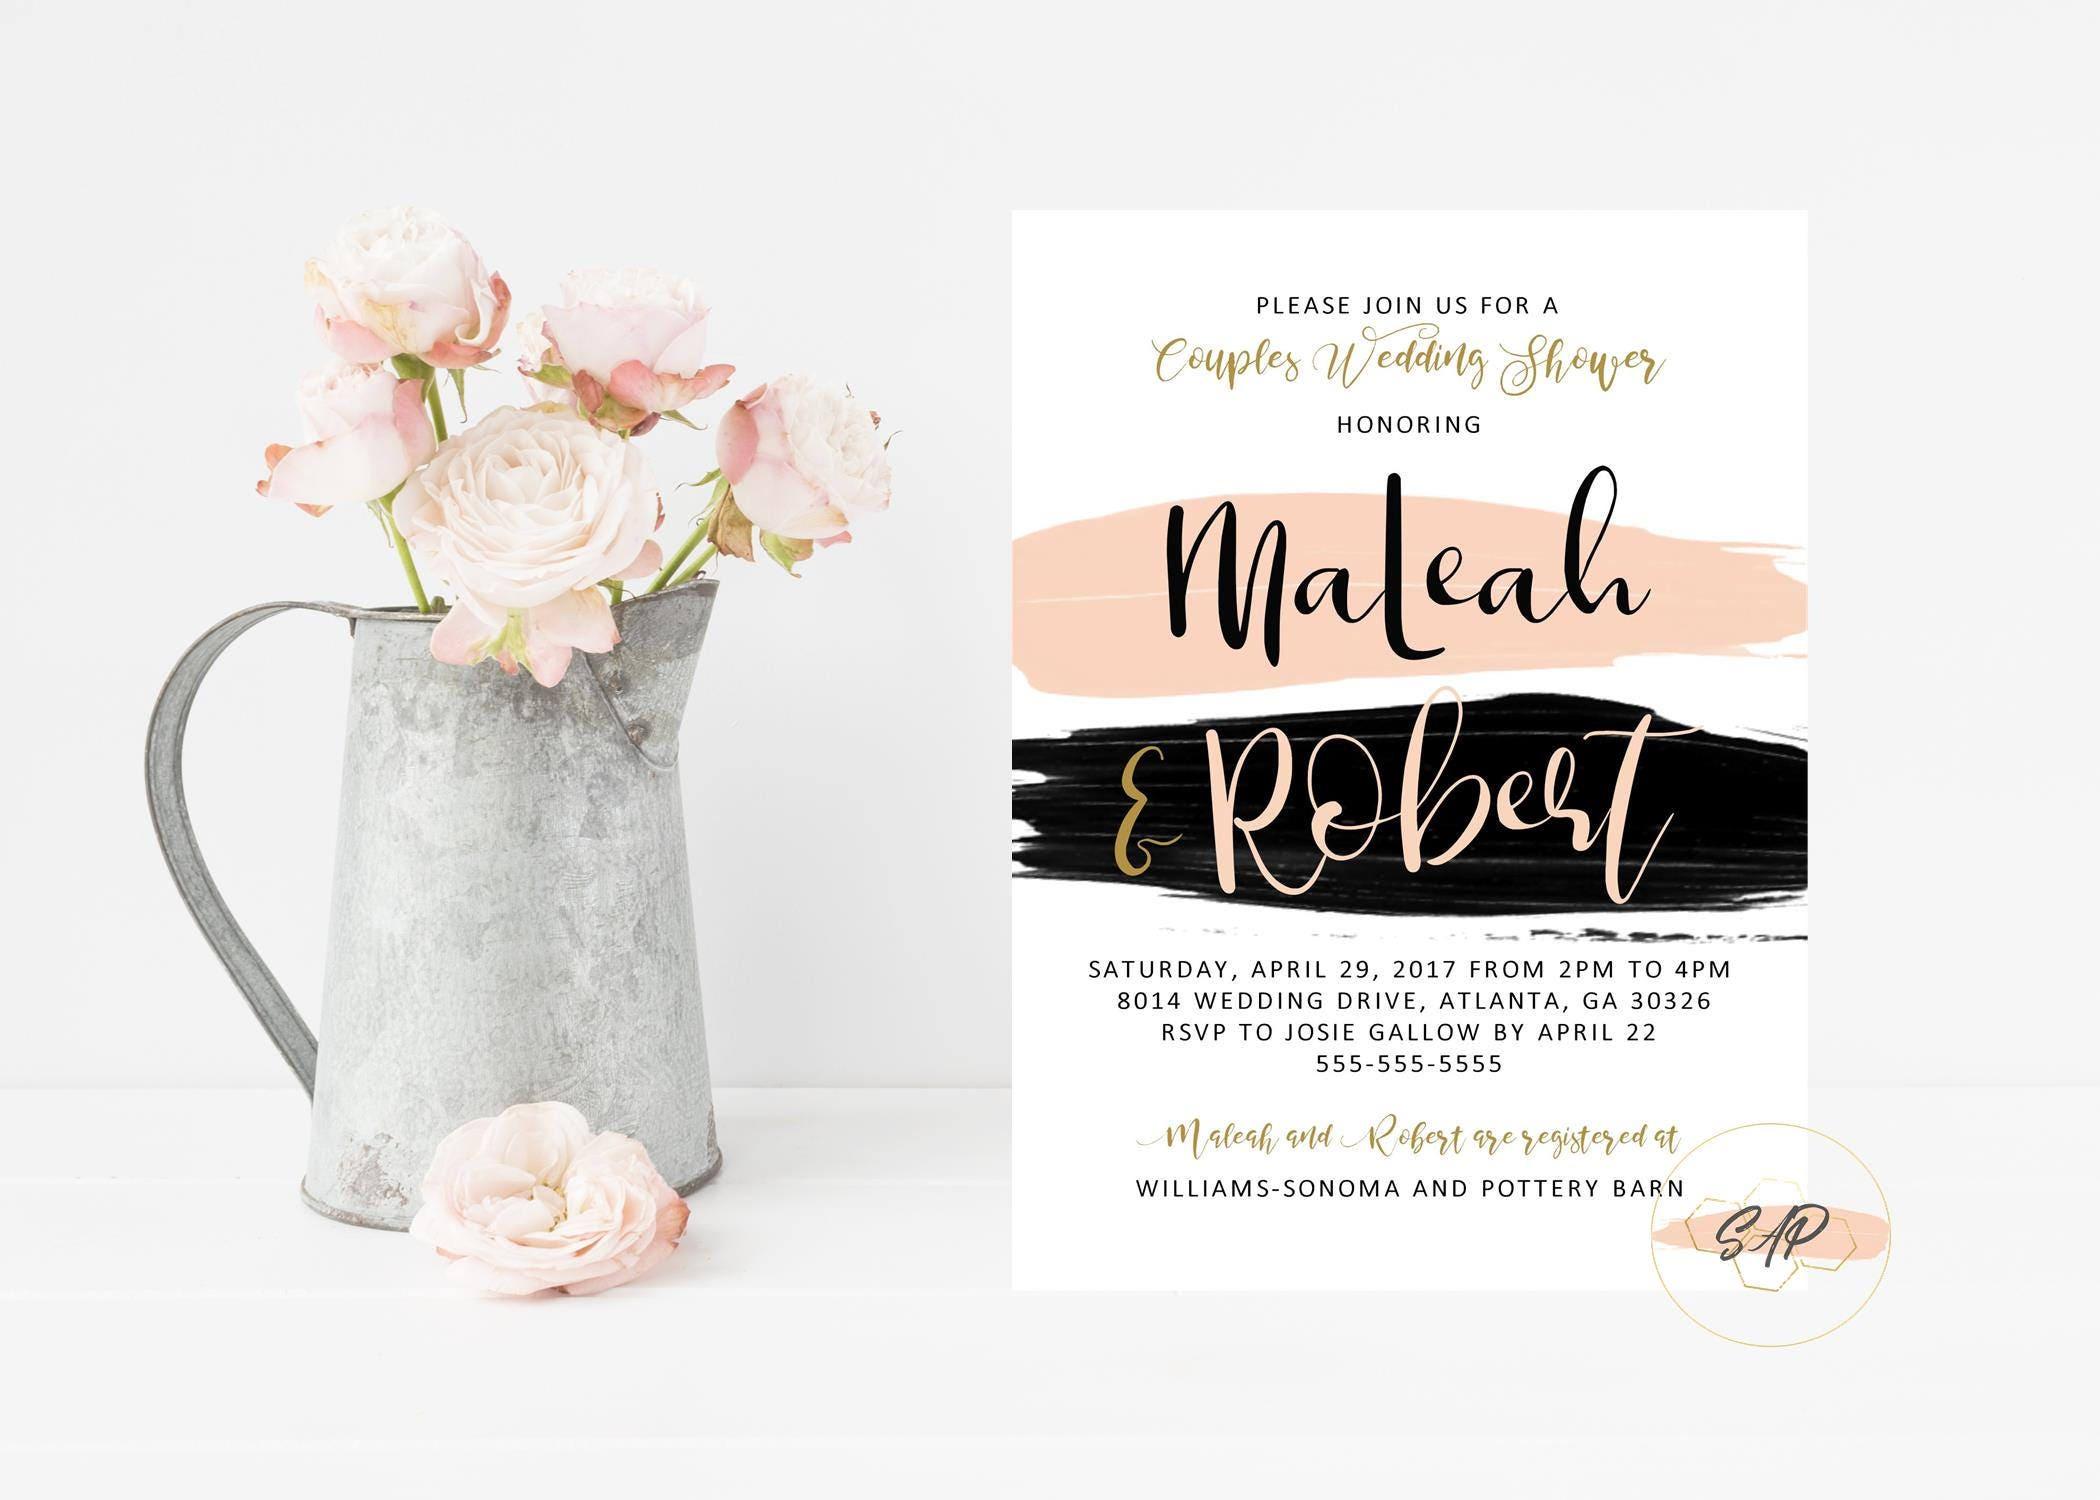 Gift Card Wedding Shower Invitation Wording: Couples Wedding Shower Invitation Wedding Shower Invites